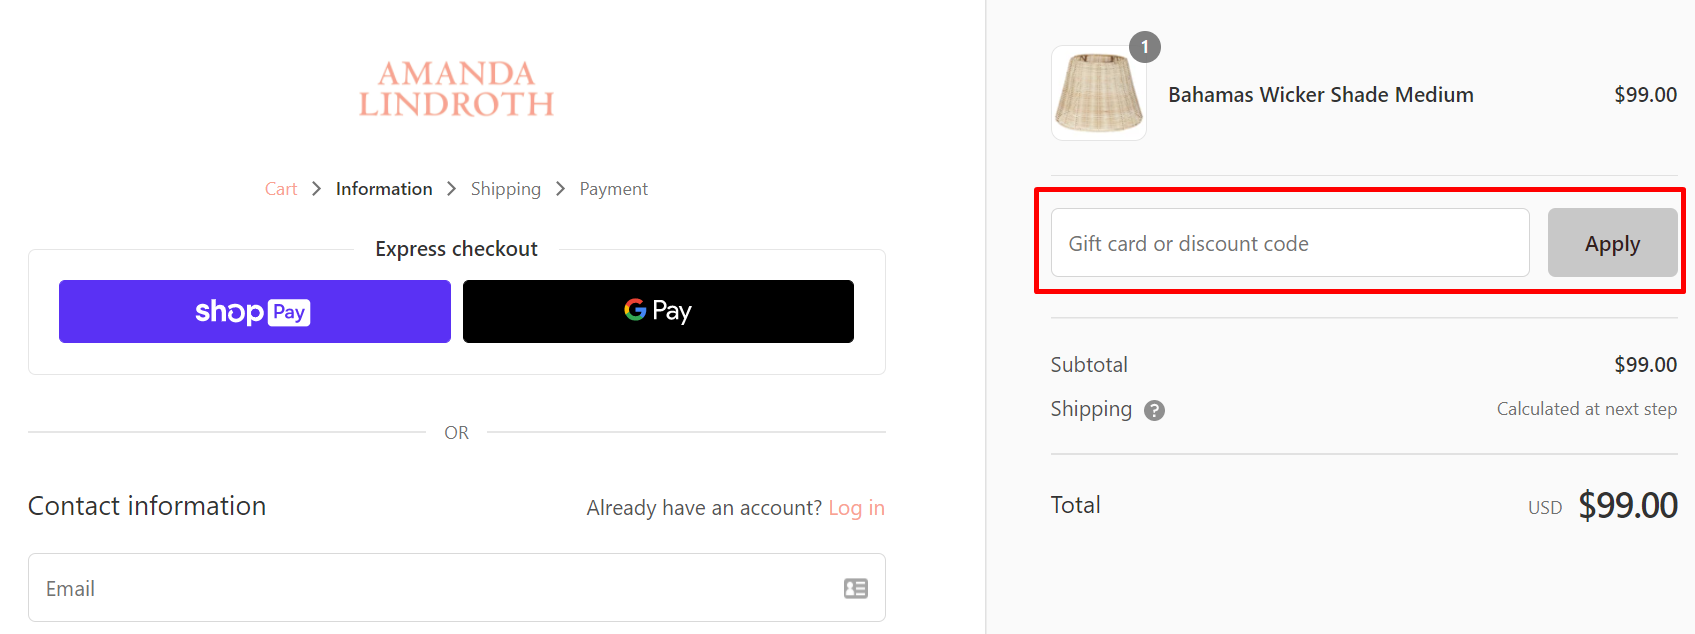 How do I use my Amanda Lindroth discount code?